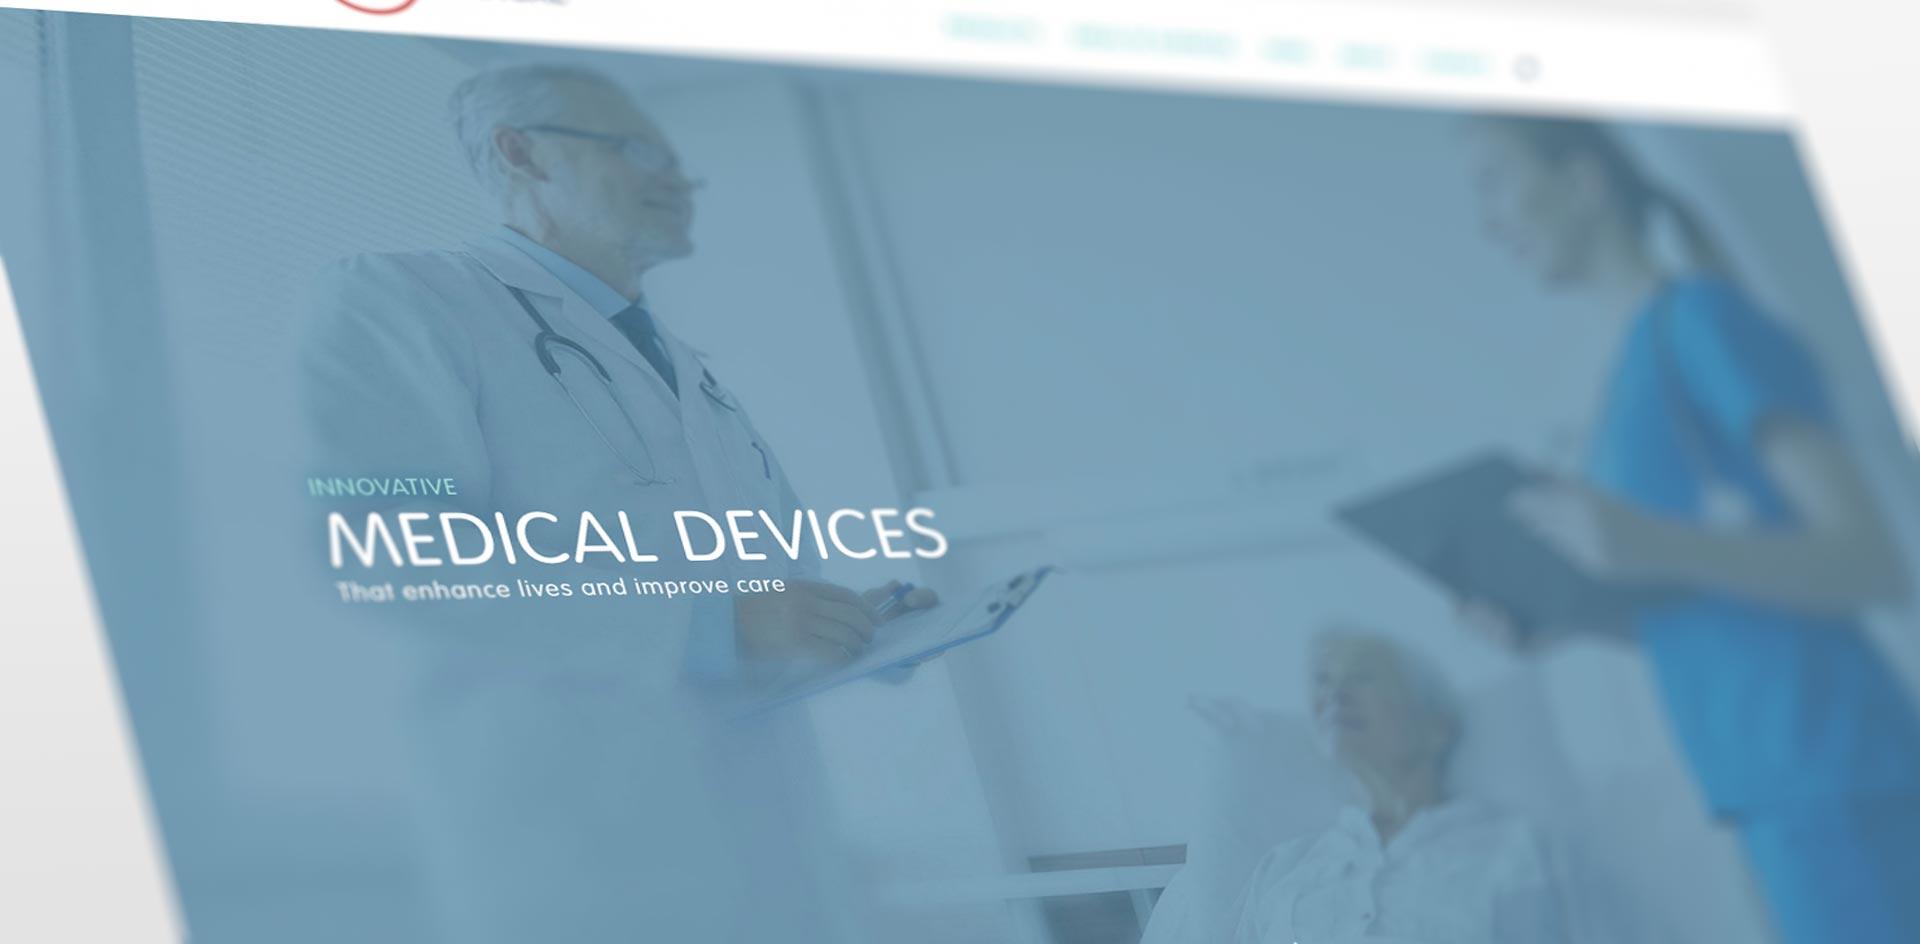 K2 Medical website development by Black Rooster Studios.